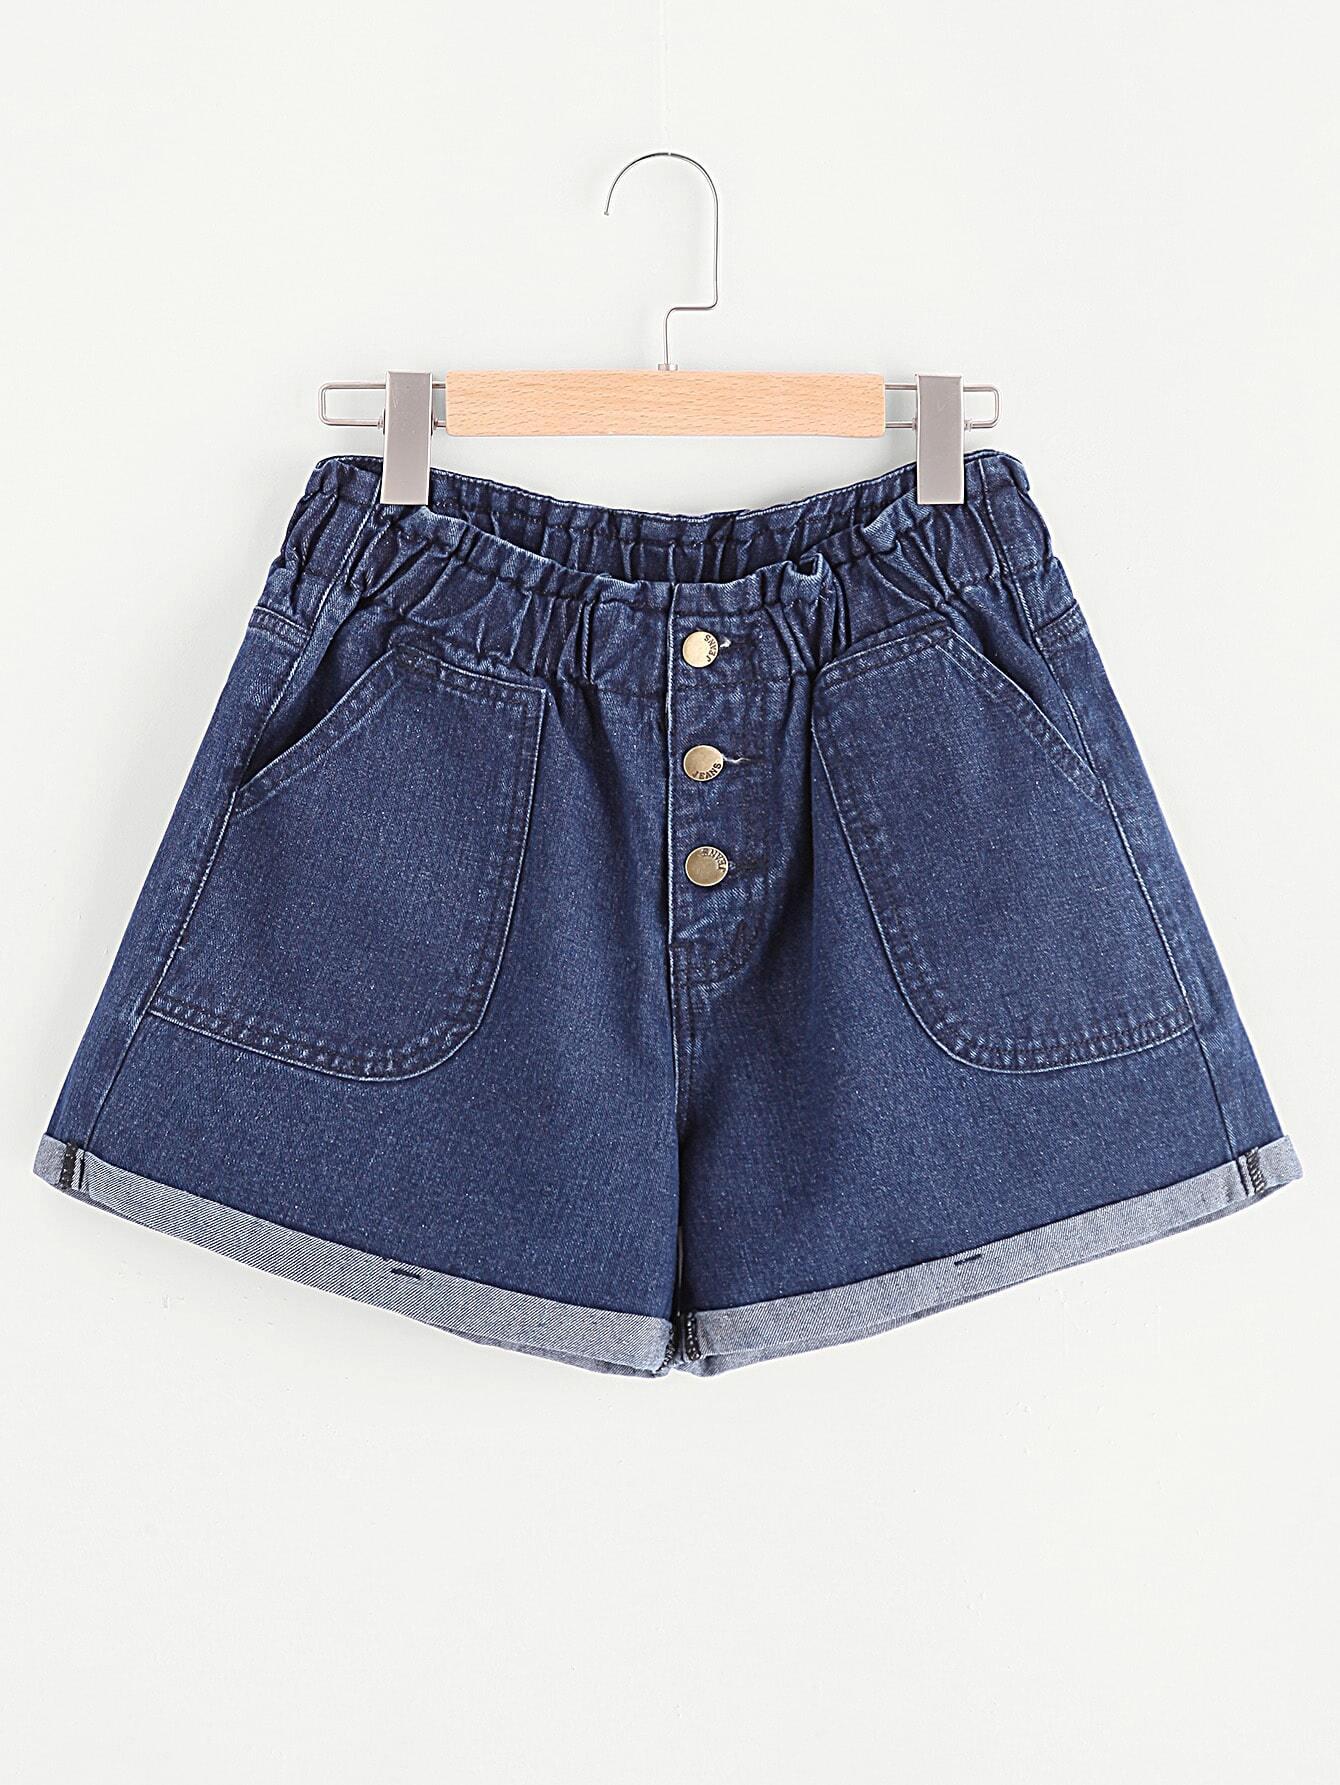 Фото Buttoned Fly Patch Pocket Cuffed Denim Shorts. Купить с доставкой